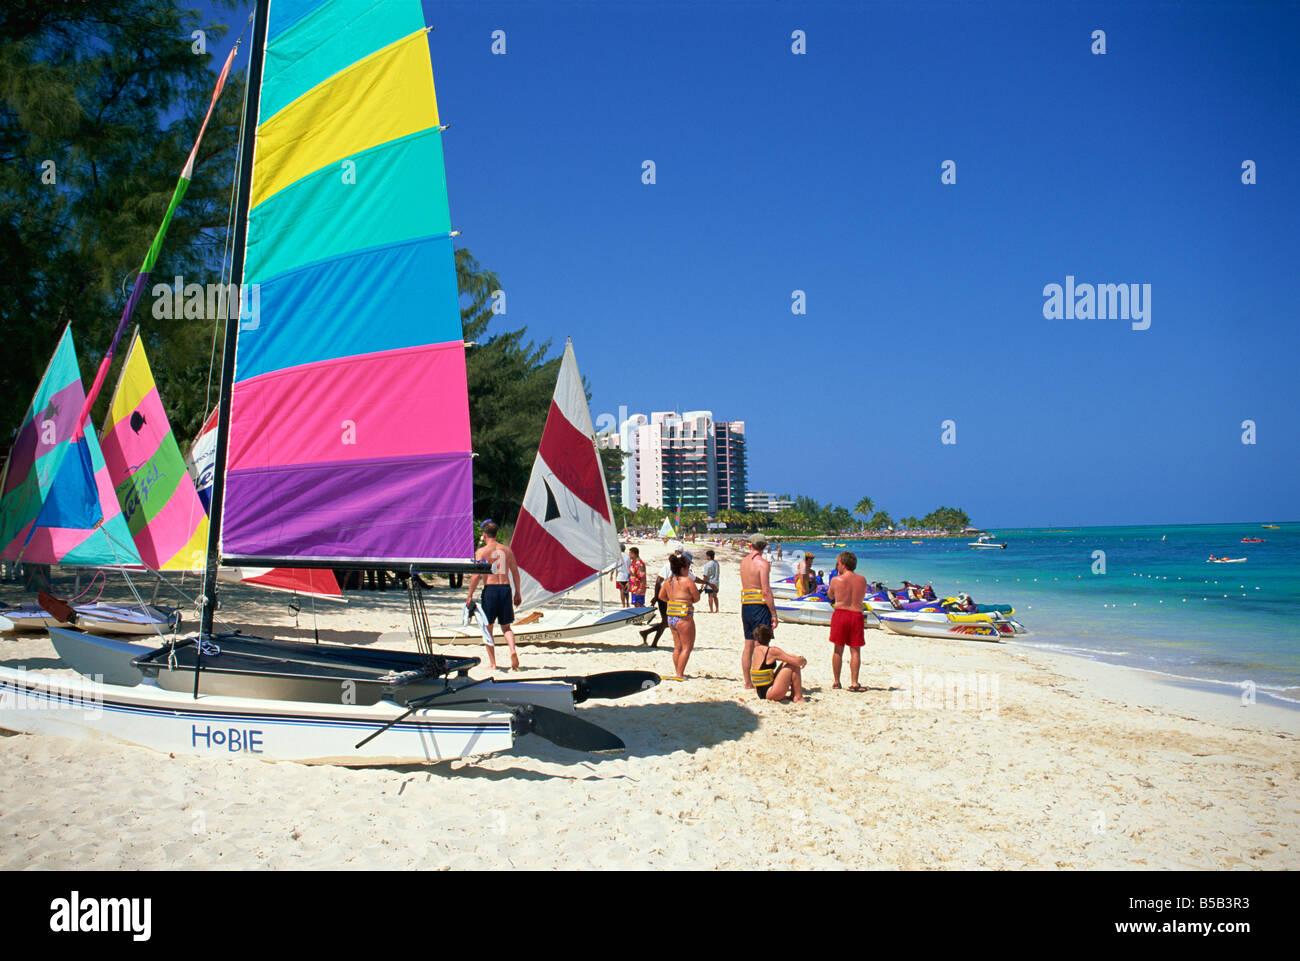 Nassau bahamas Dating-Seiten Online-Dating, wenn er anruft